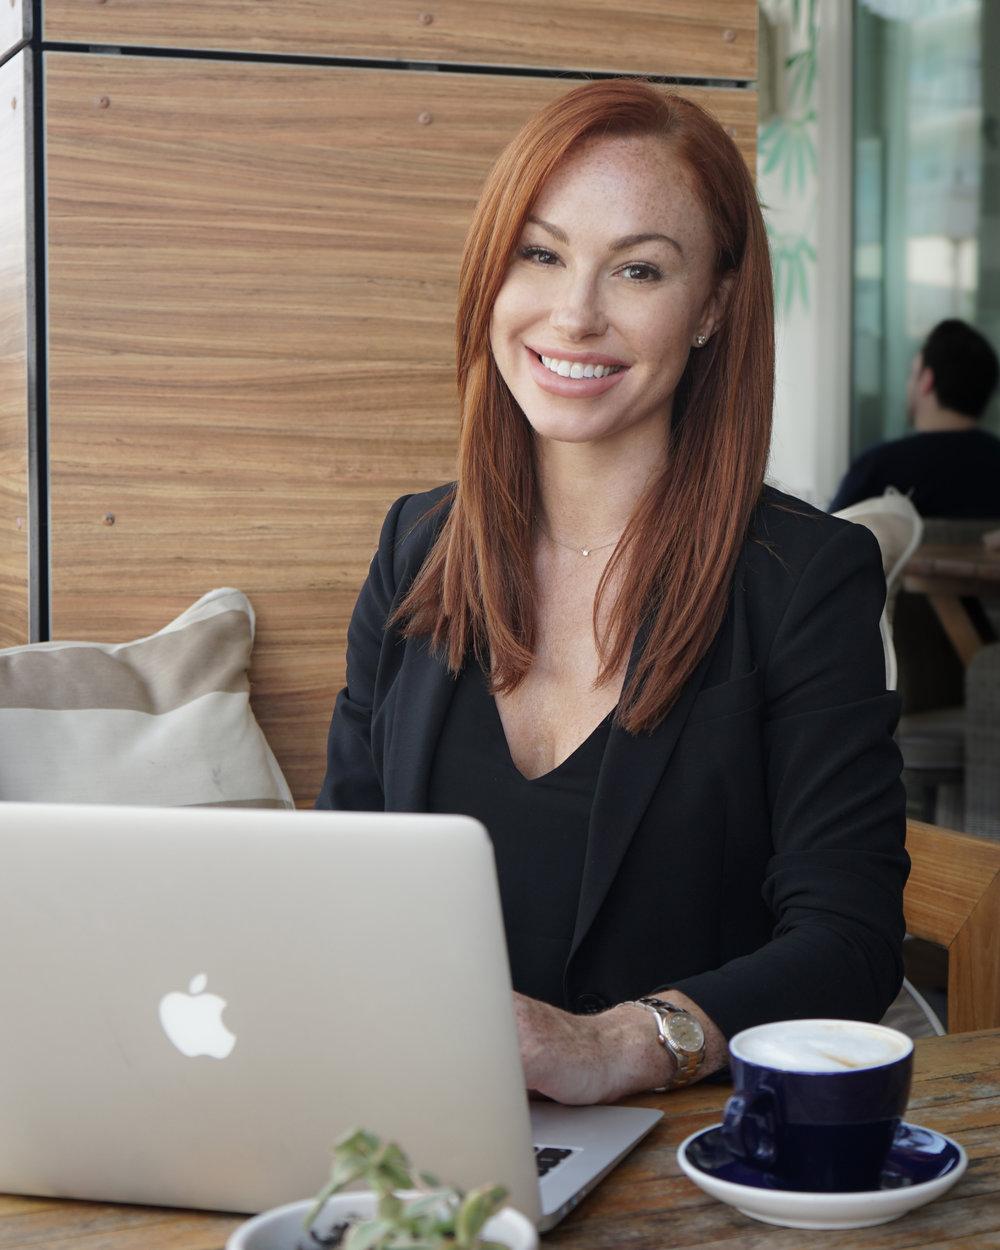 Jessica_Higgins_Miami_Beach_Entrepreneur.jpg